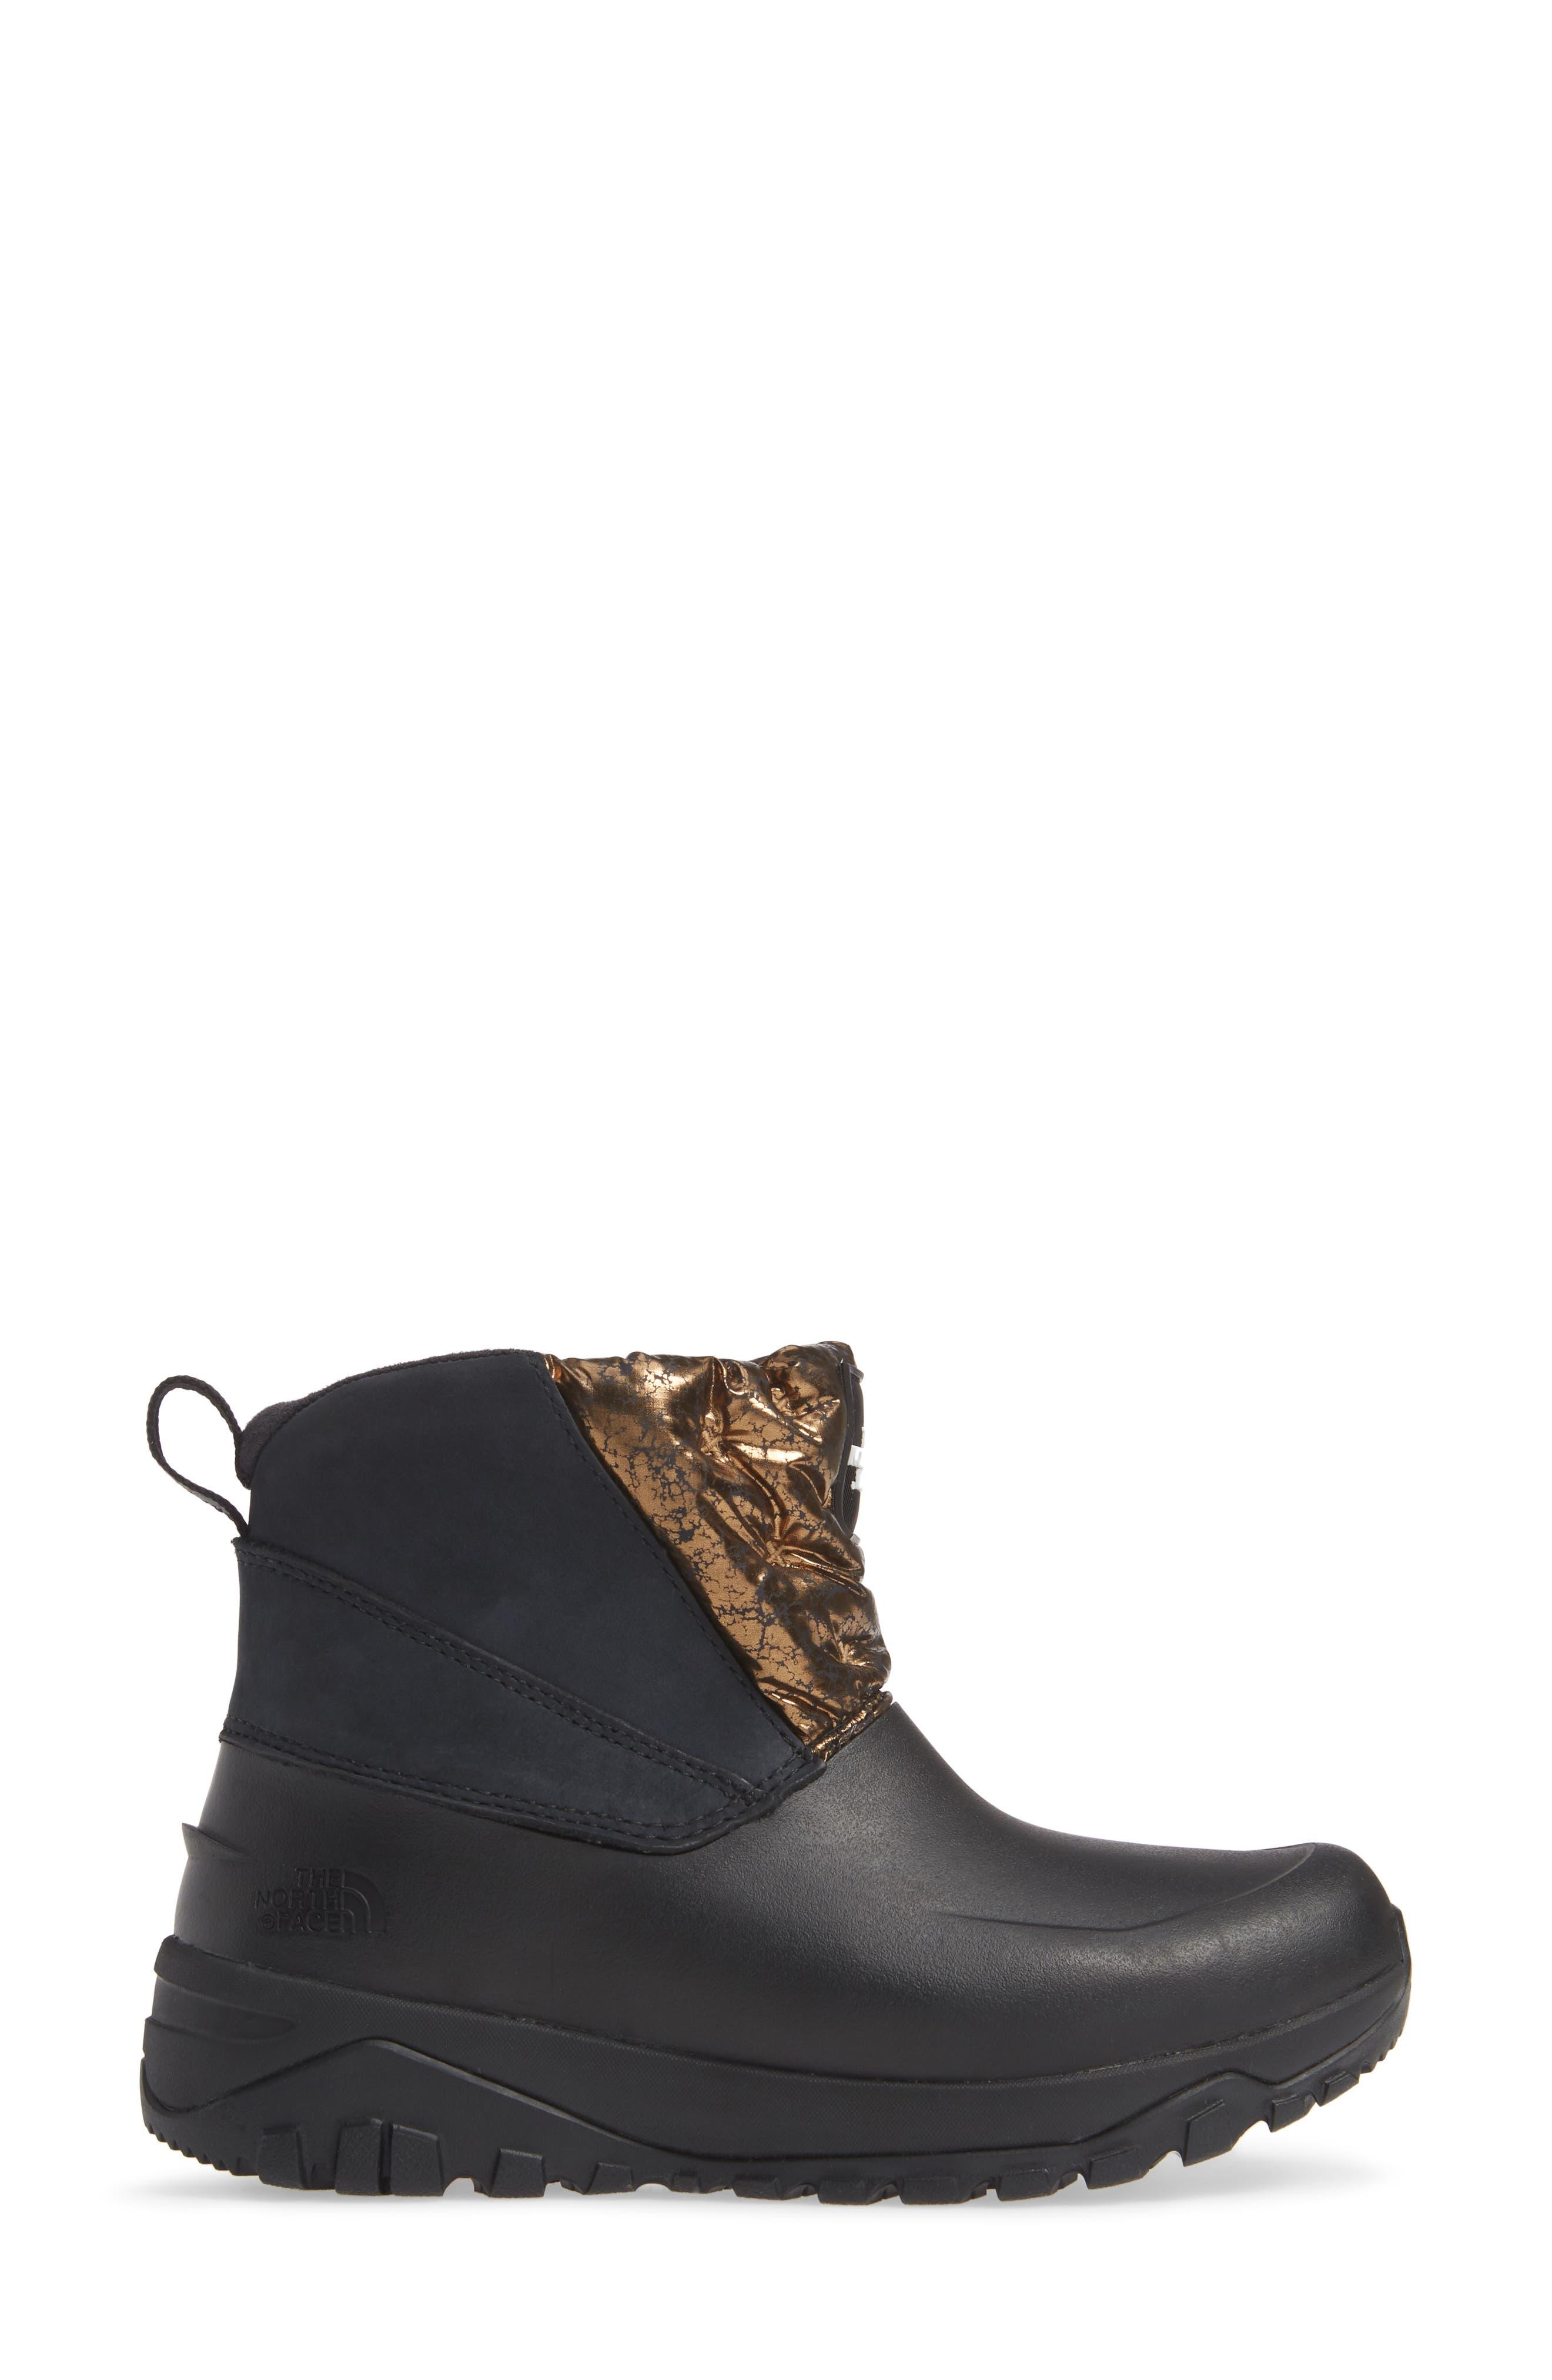 Yukiona Waterproof Ankle Boot,                             Alternate thumbnail 3, color,                             BLACK/ METALLIC COPPER